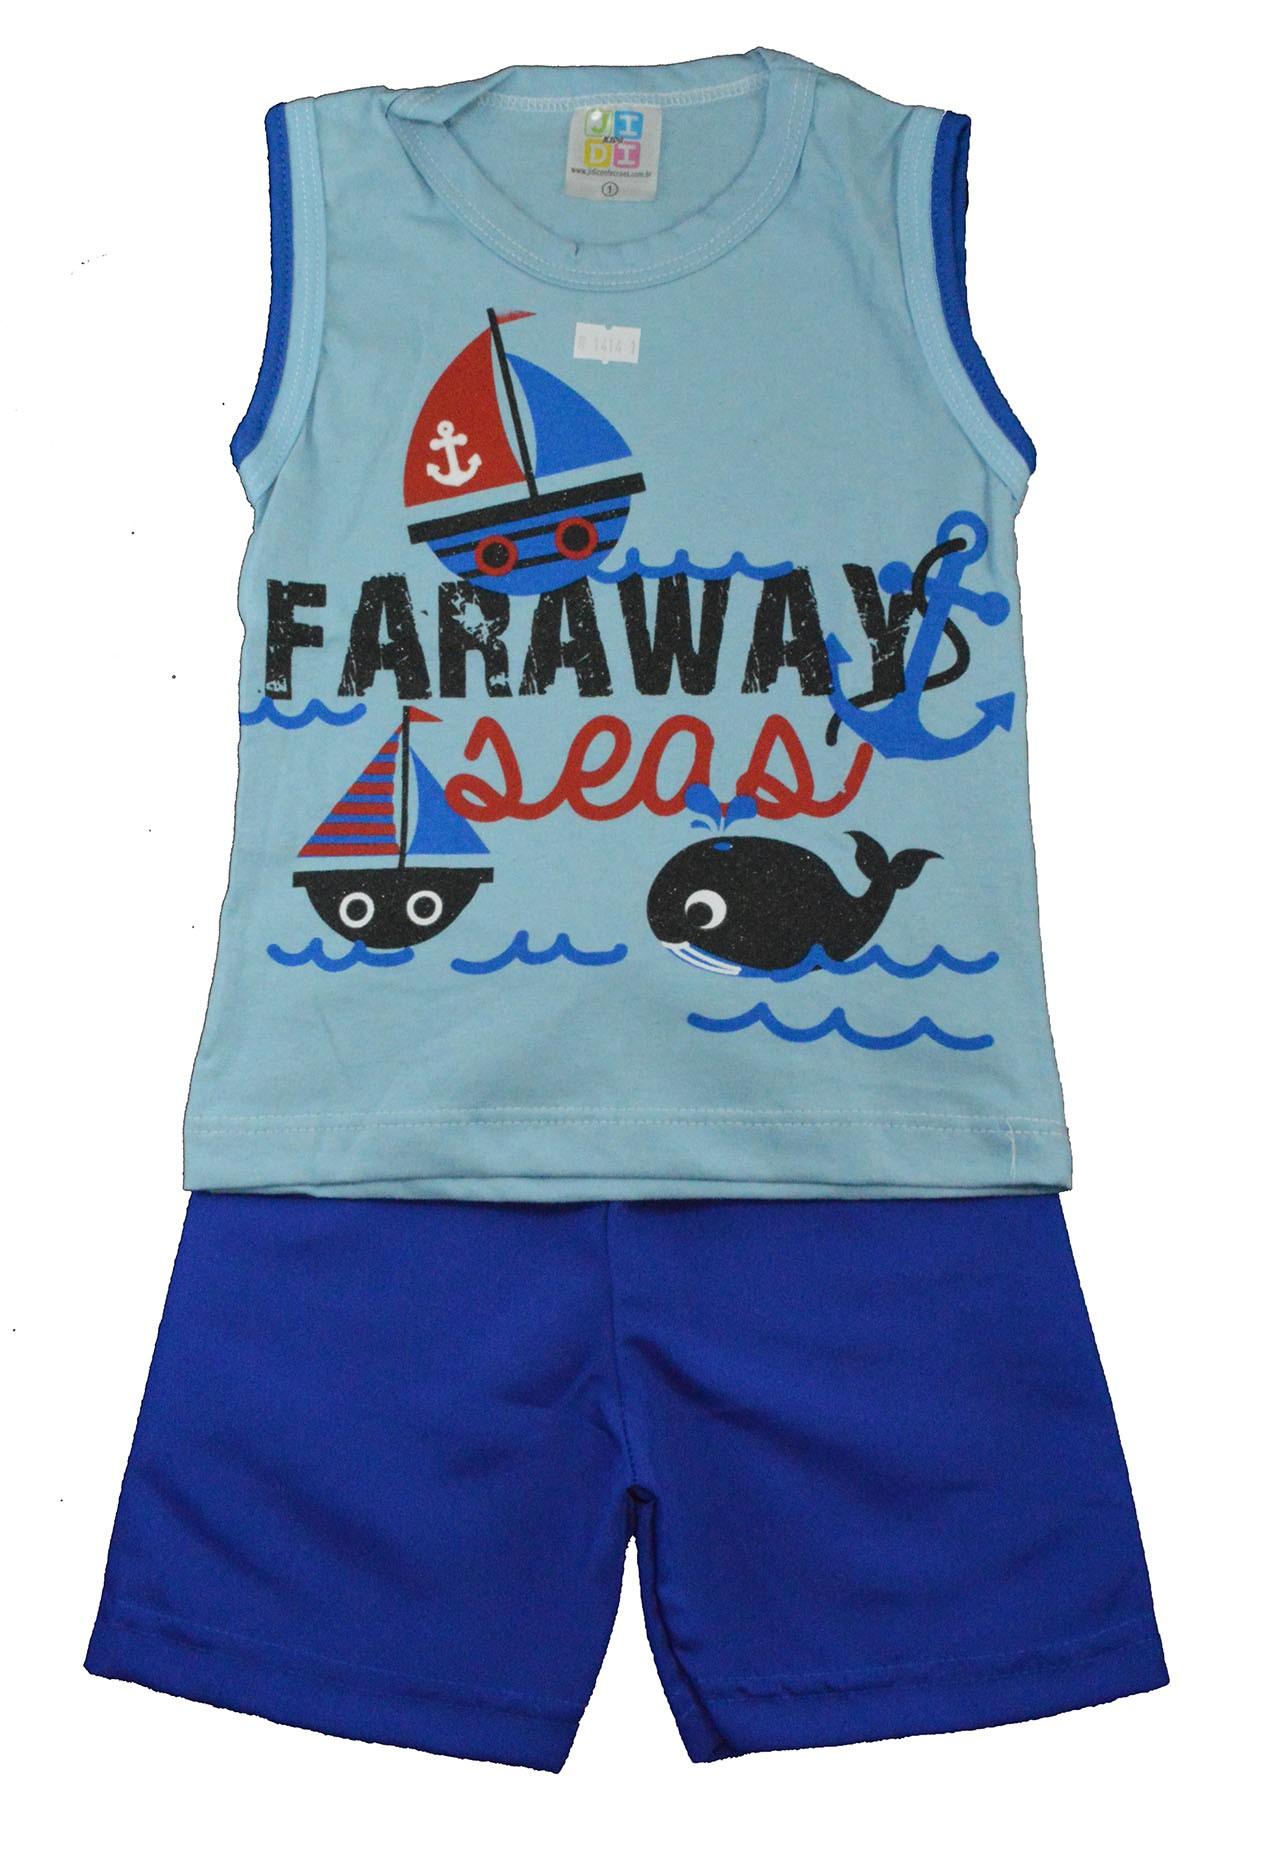 Conjunto Infantil de Verão Barco Faraway Azul Jidi